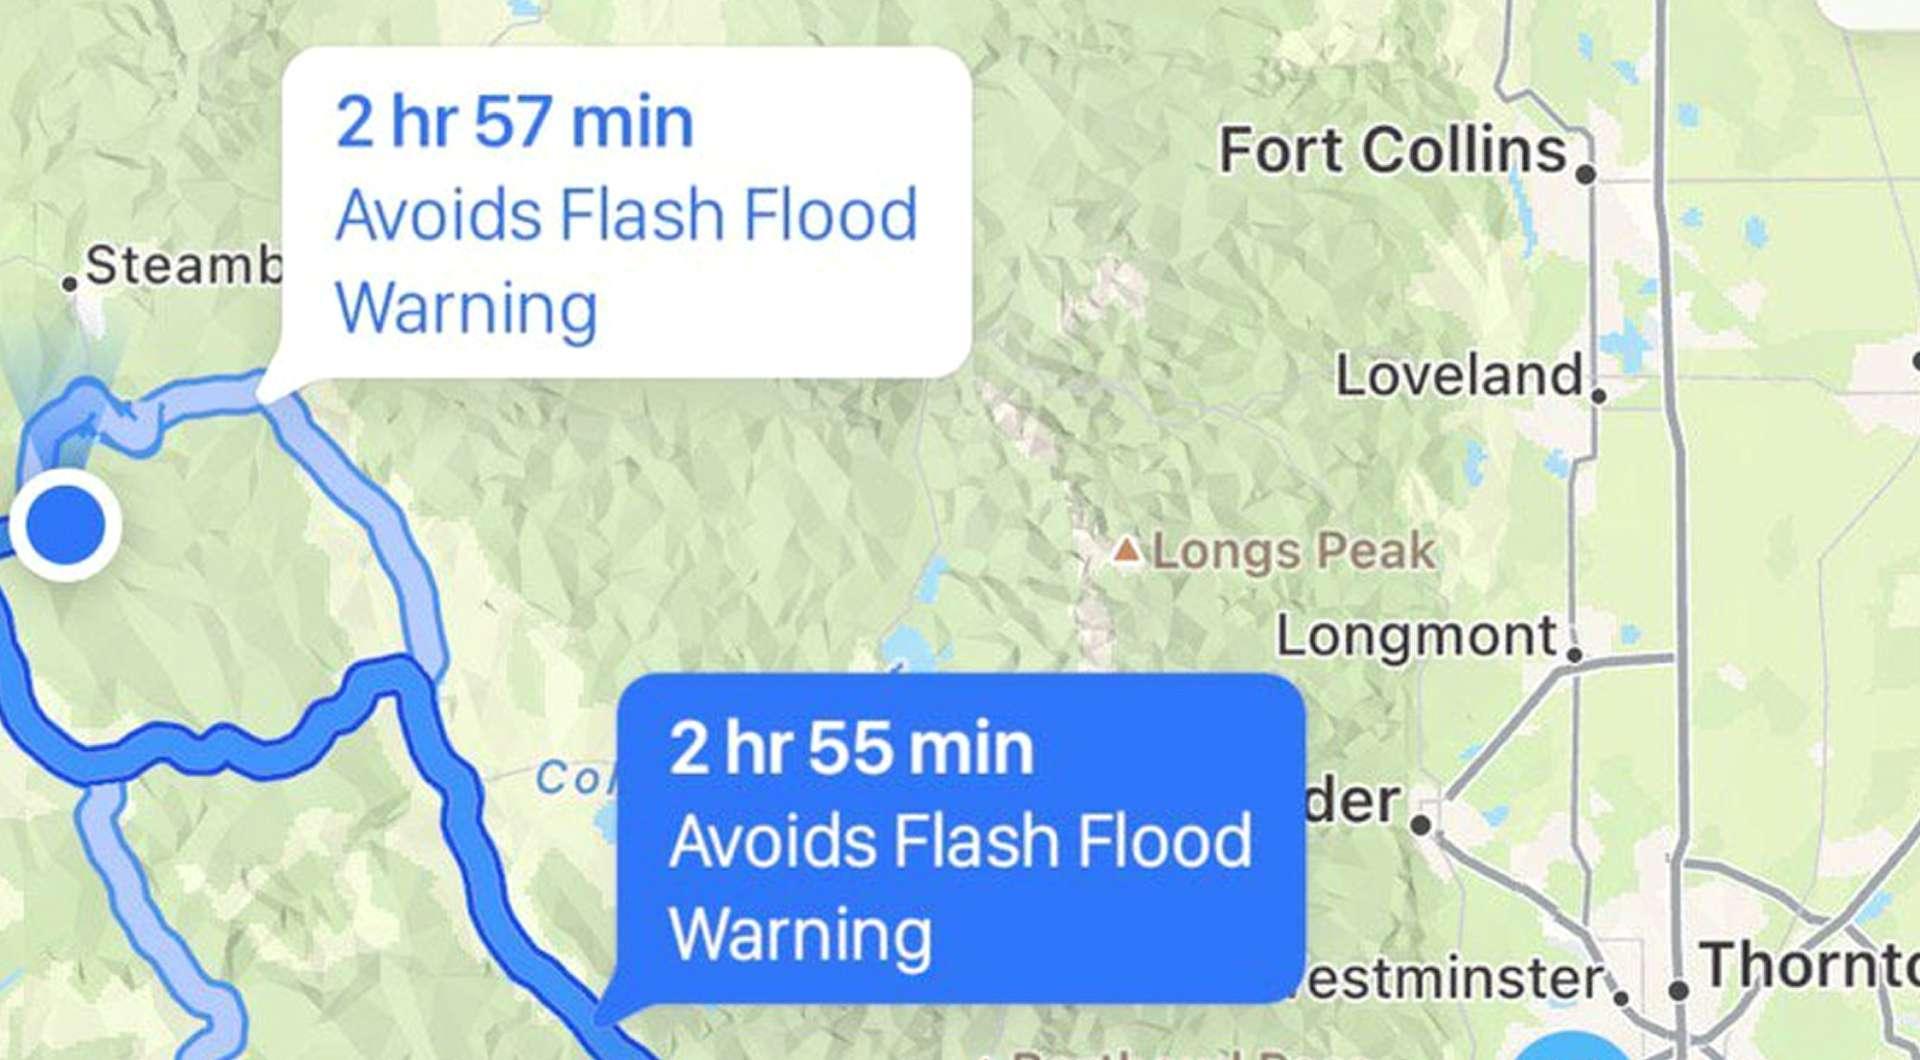 iOS 15 Apple Maps hazard warnings